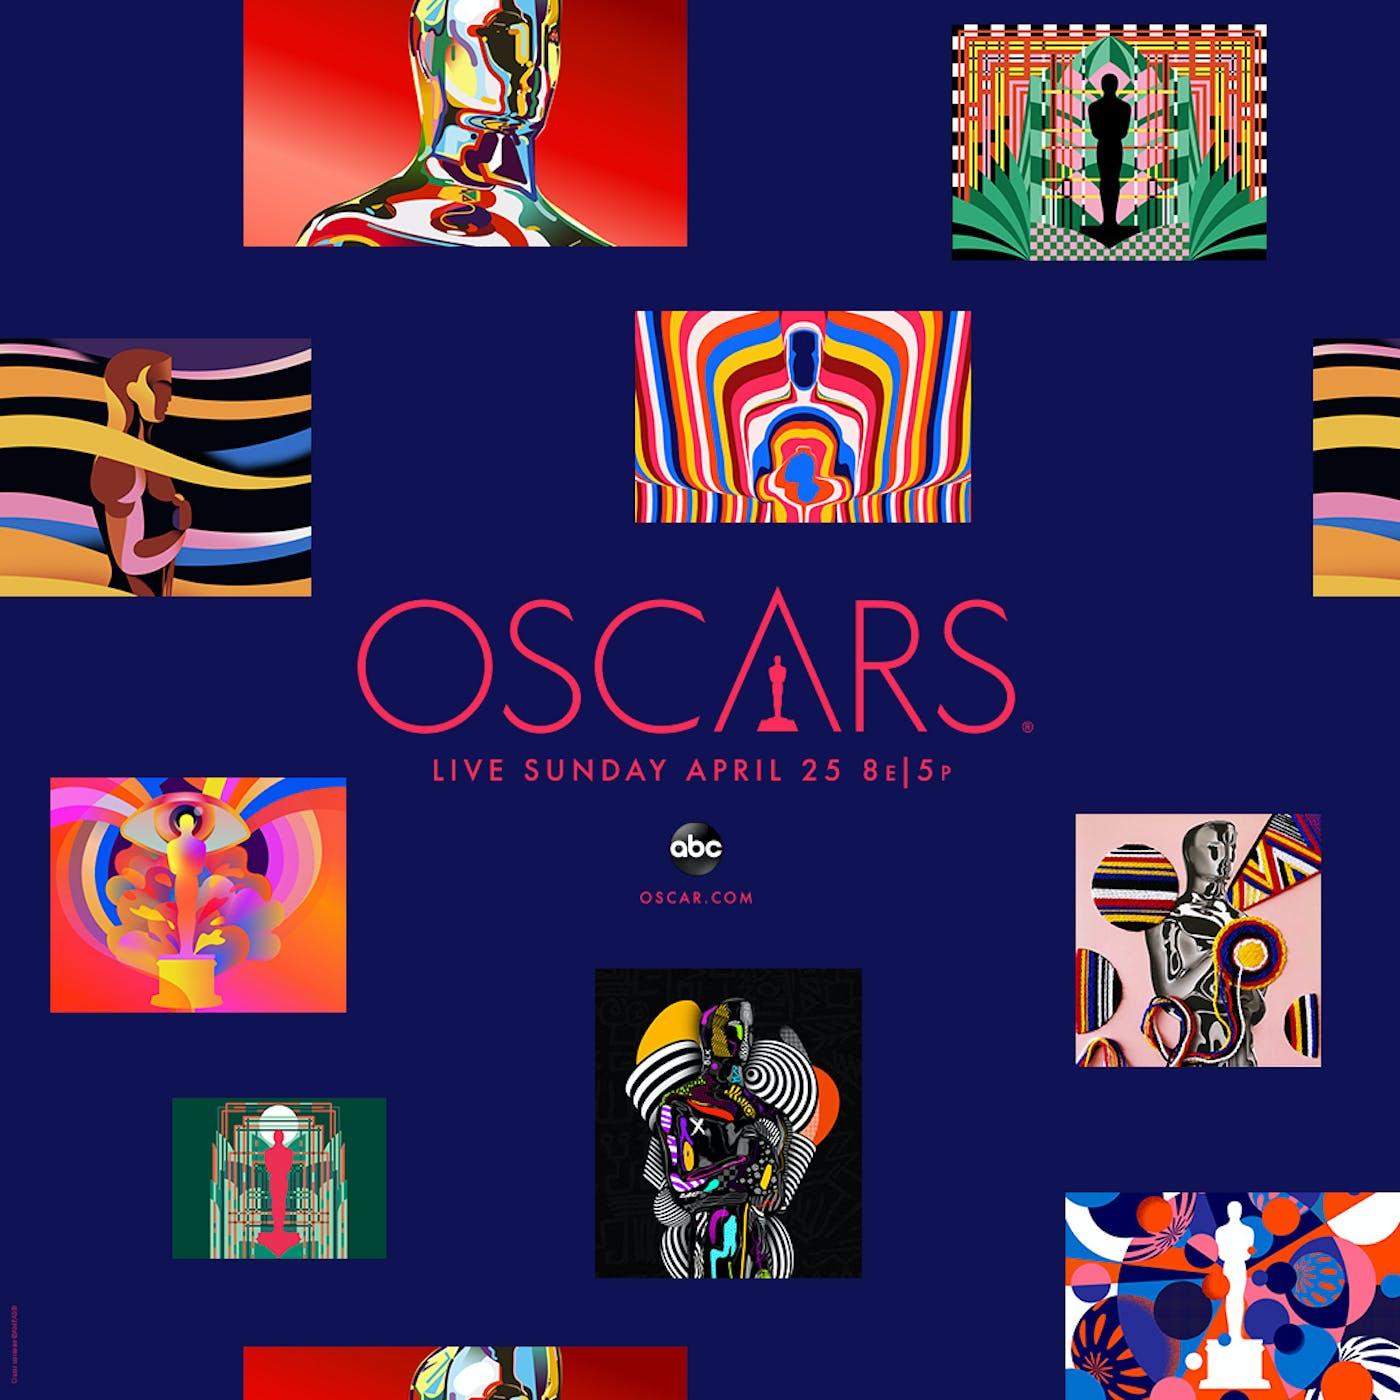 93 Oscars KA Poster Square 1080x1080 Navy